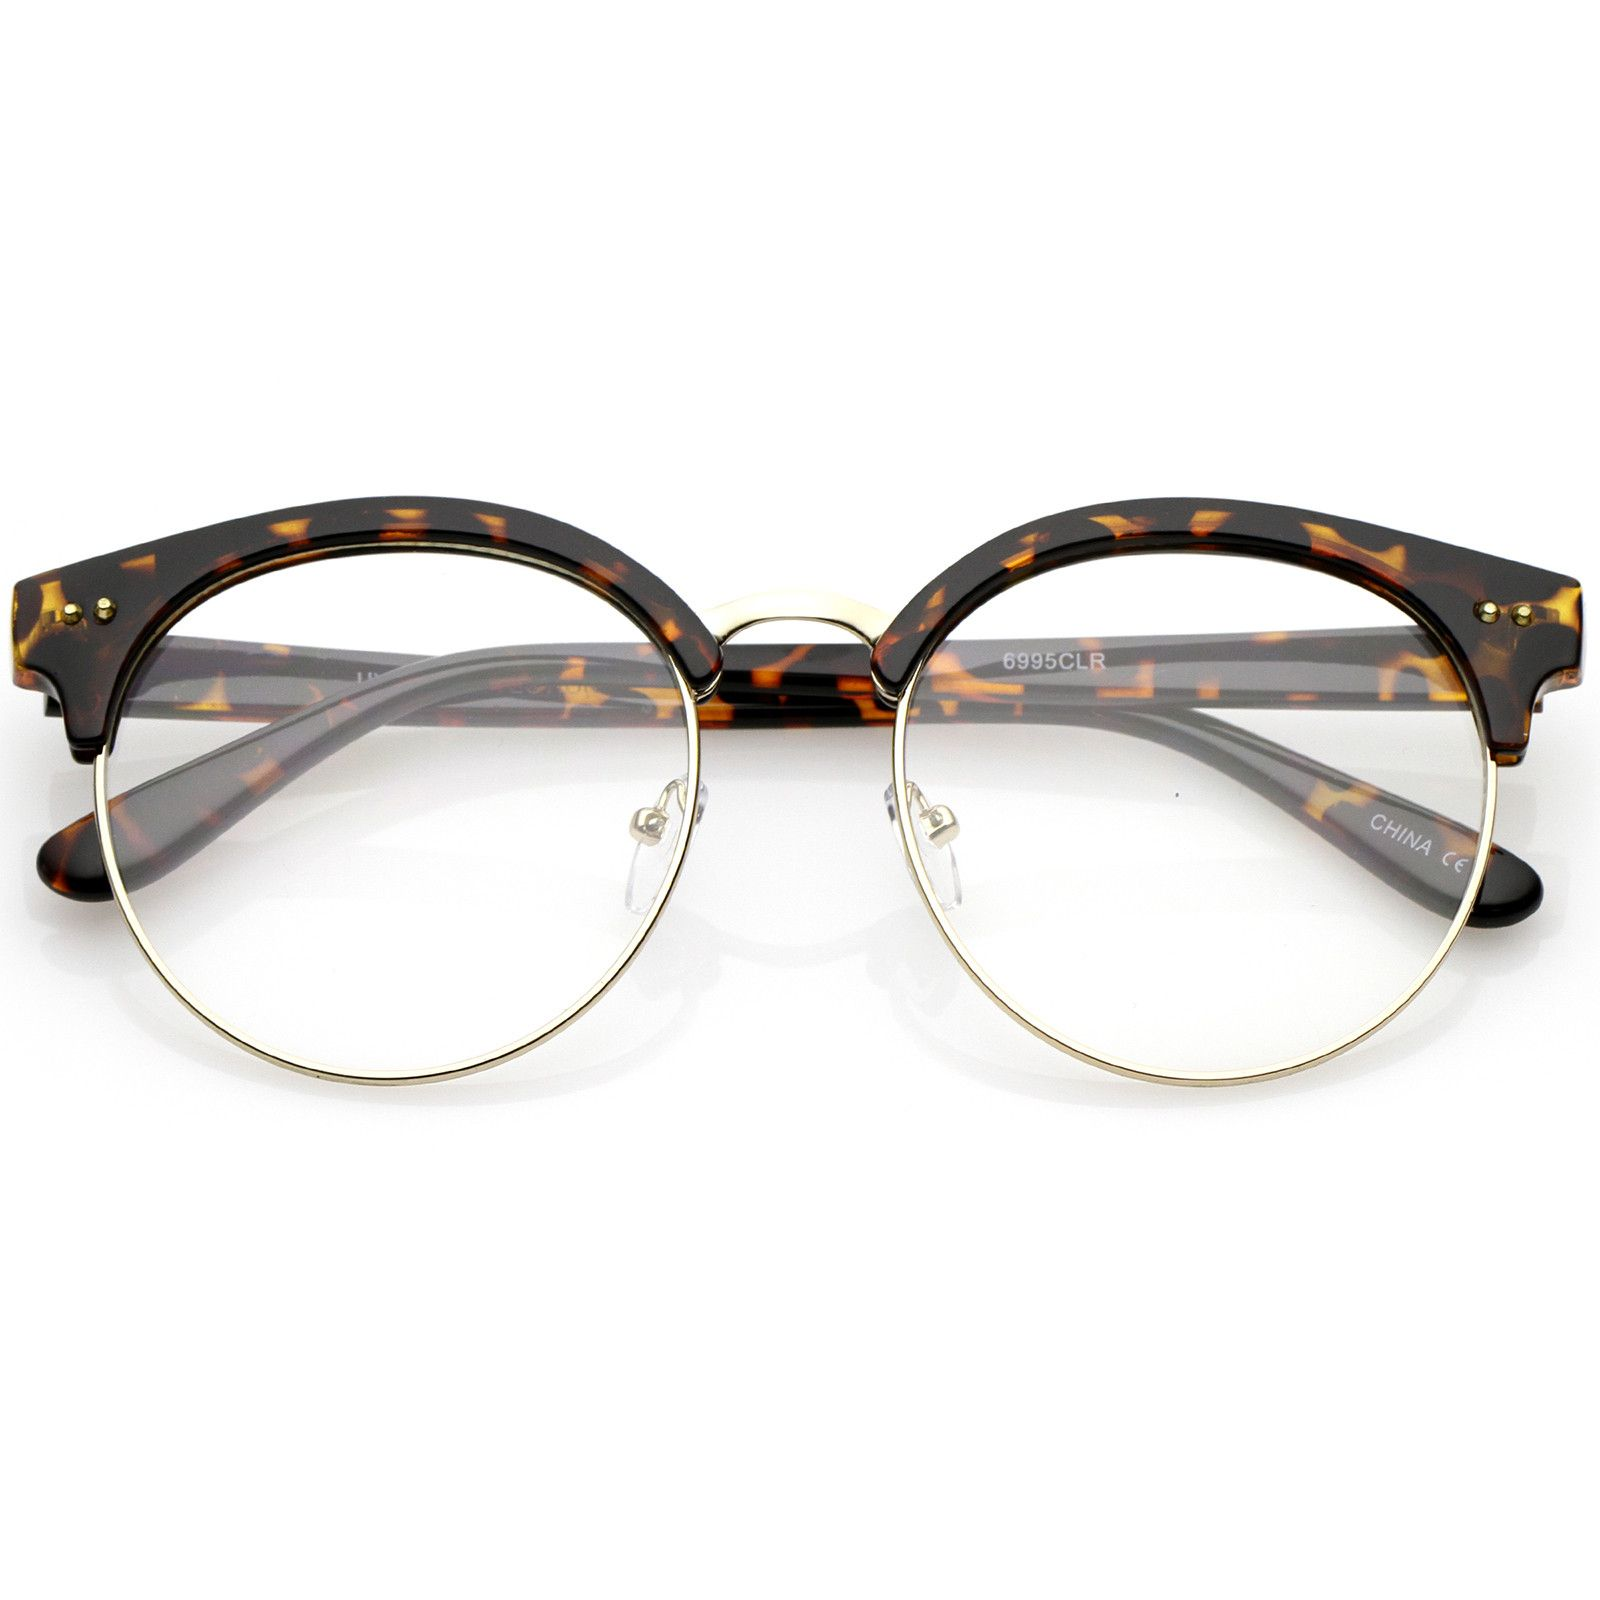 Classic Horn Rimmed Round Clear Flat Lens Half Frame Eyeglasses